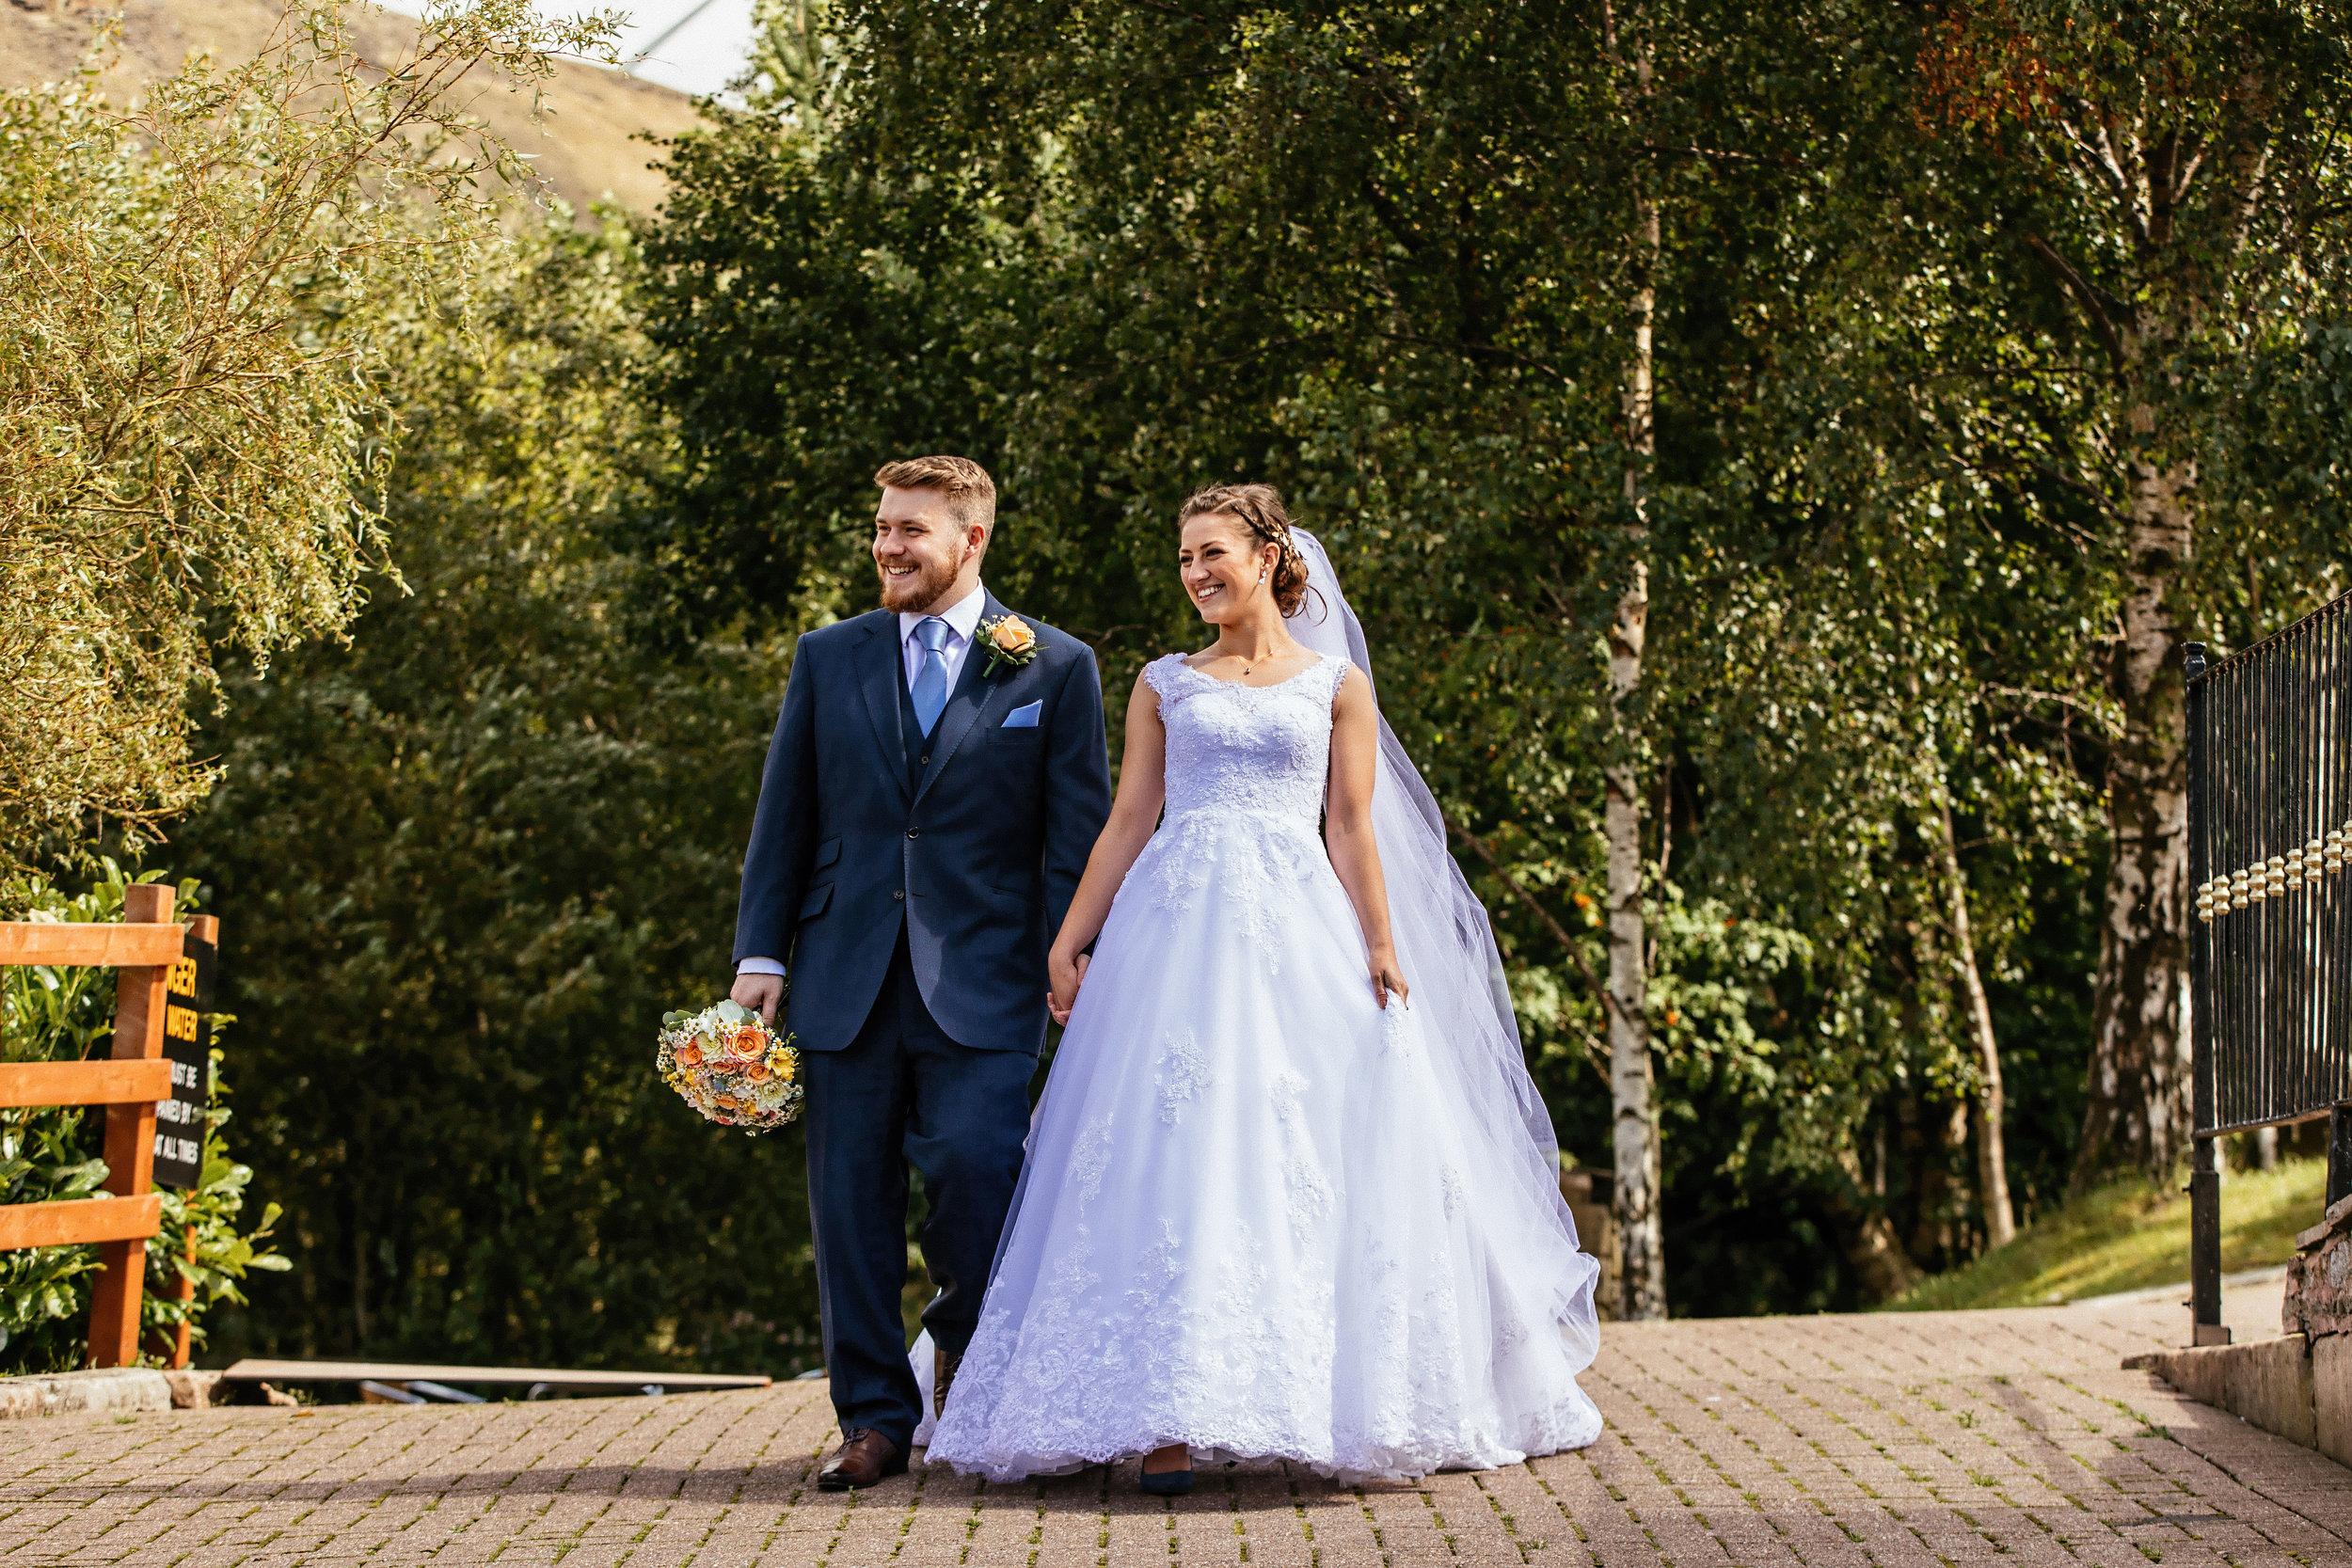 Kathryn-and-Mike-Wedding-Highlights-47.jpg